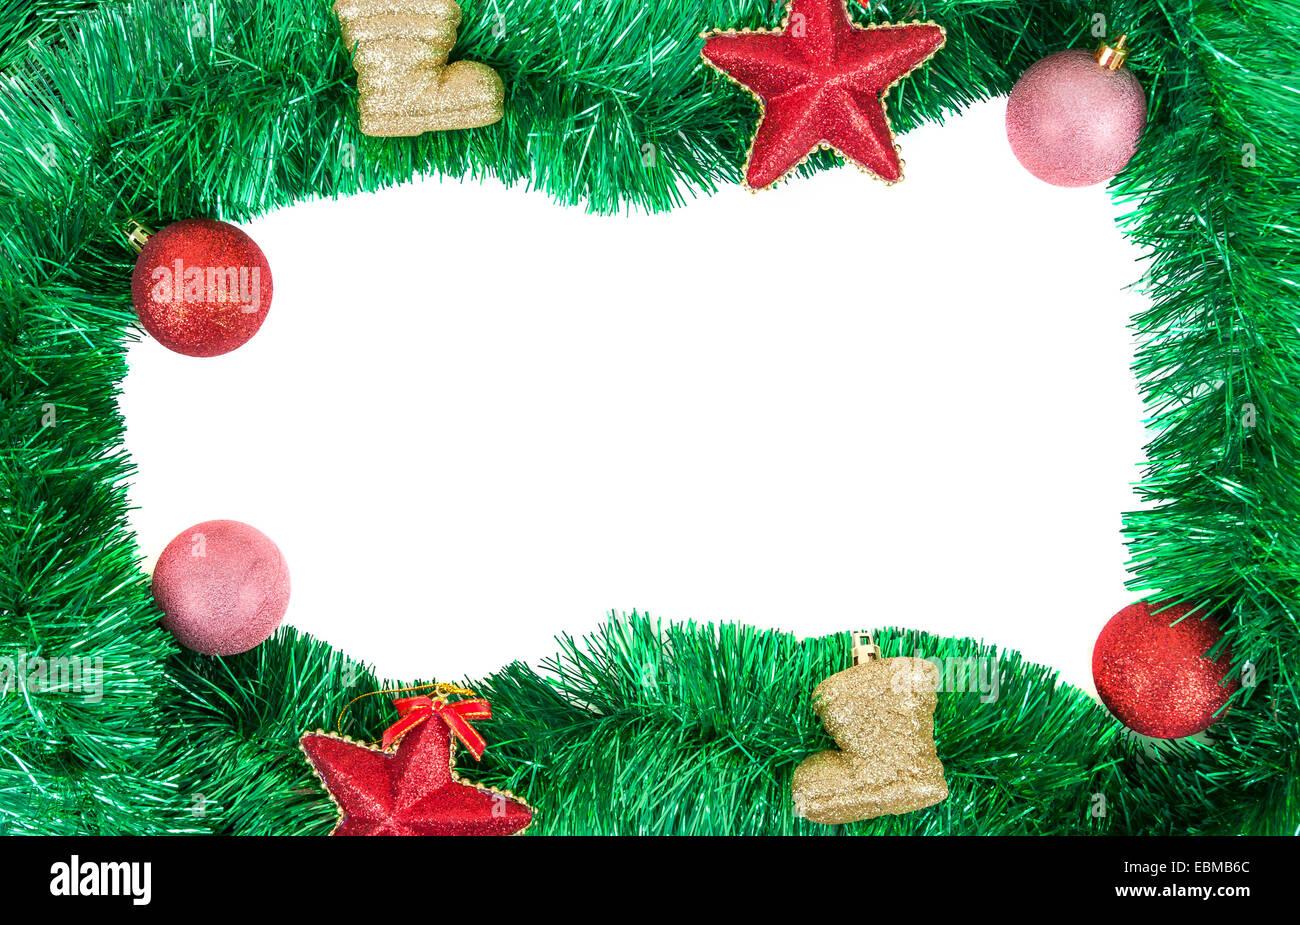 Christmas Frame Baubles Stockfotos & Christmas Frame Baubles Bilder ...